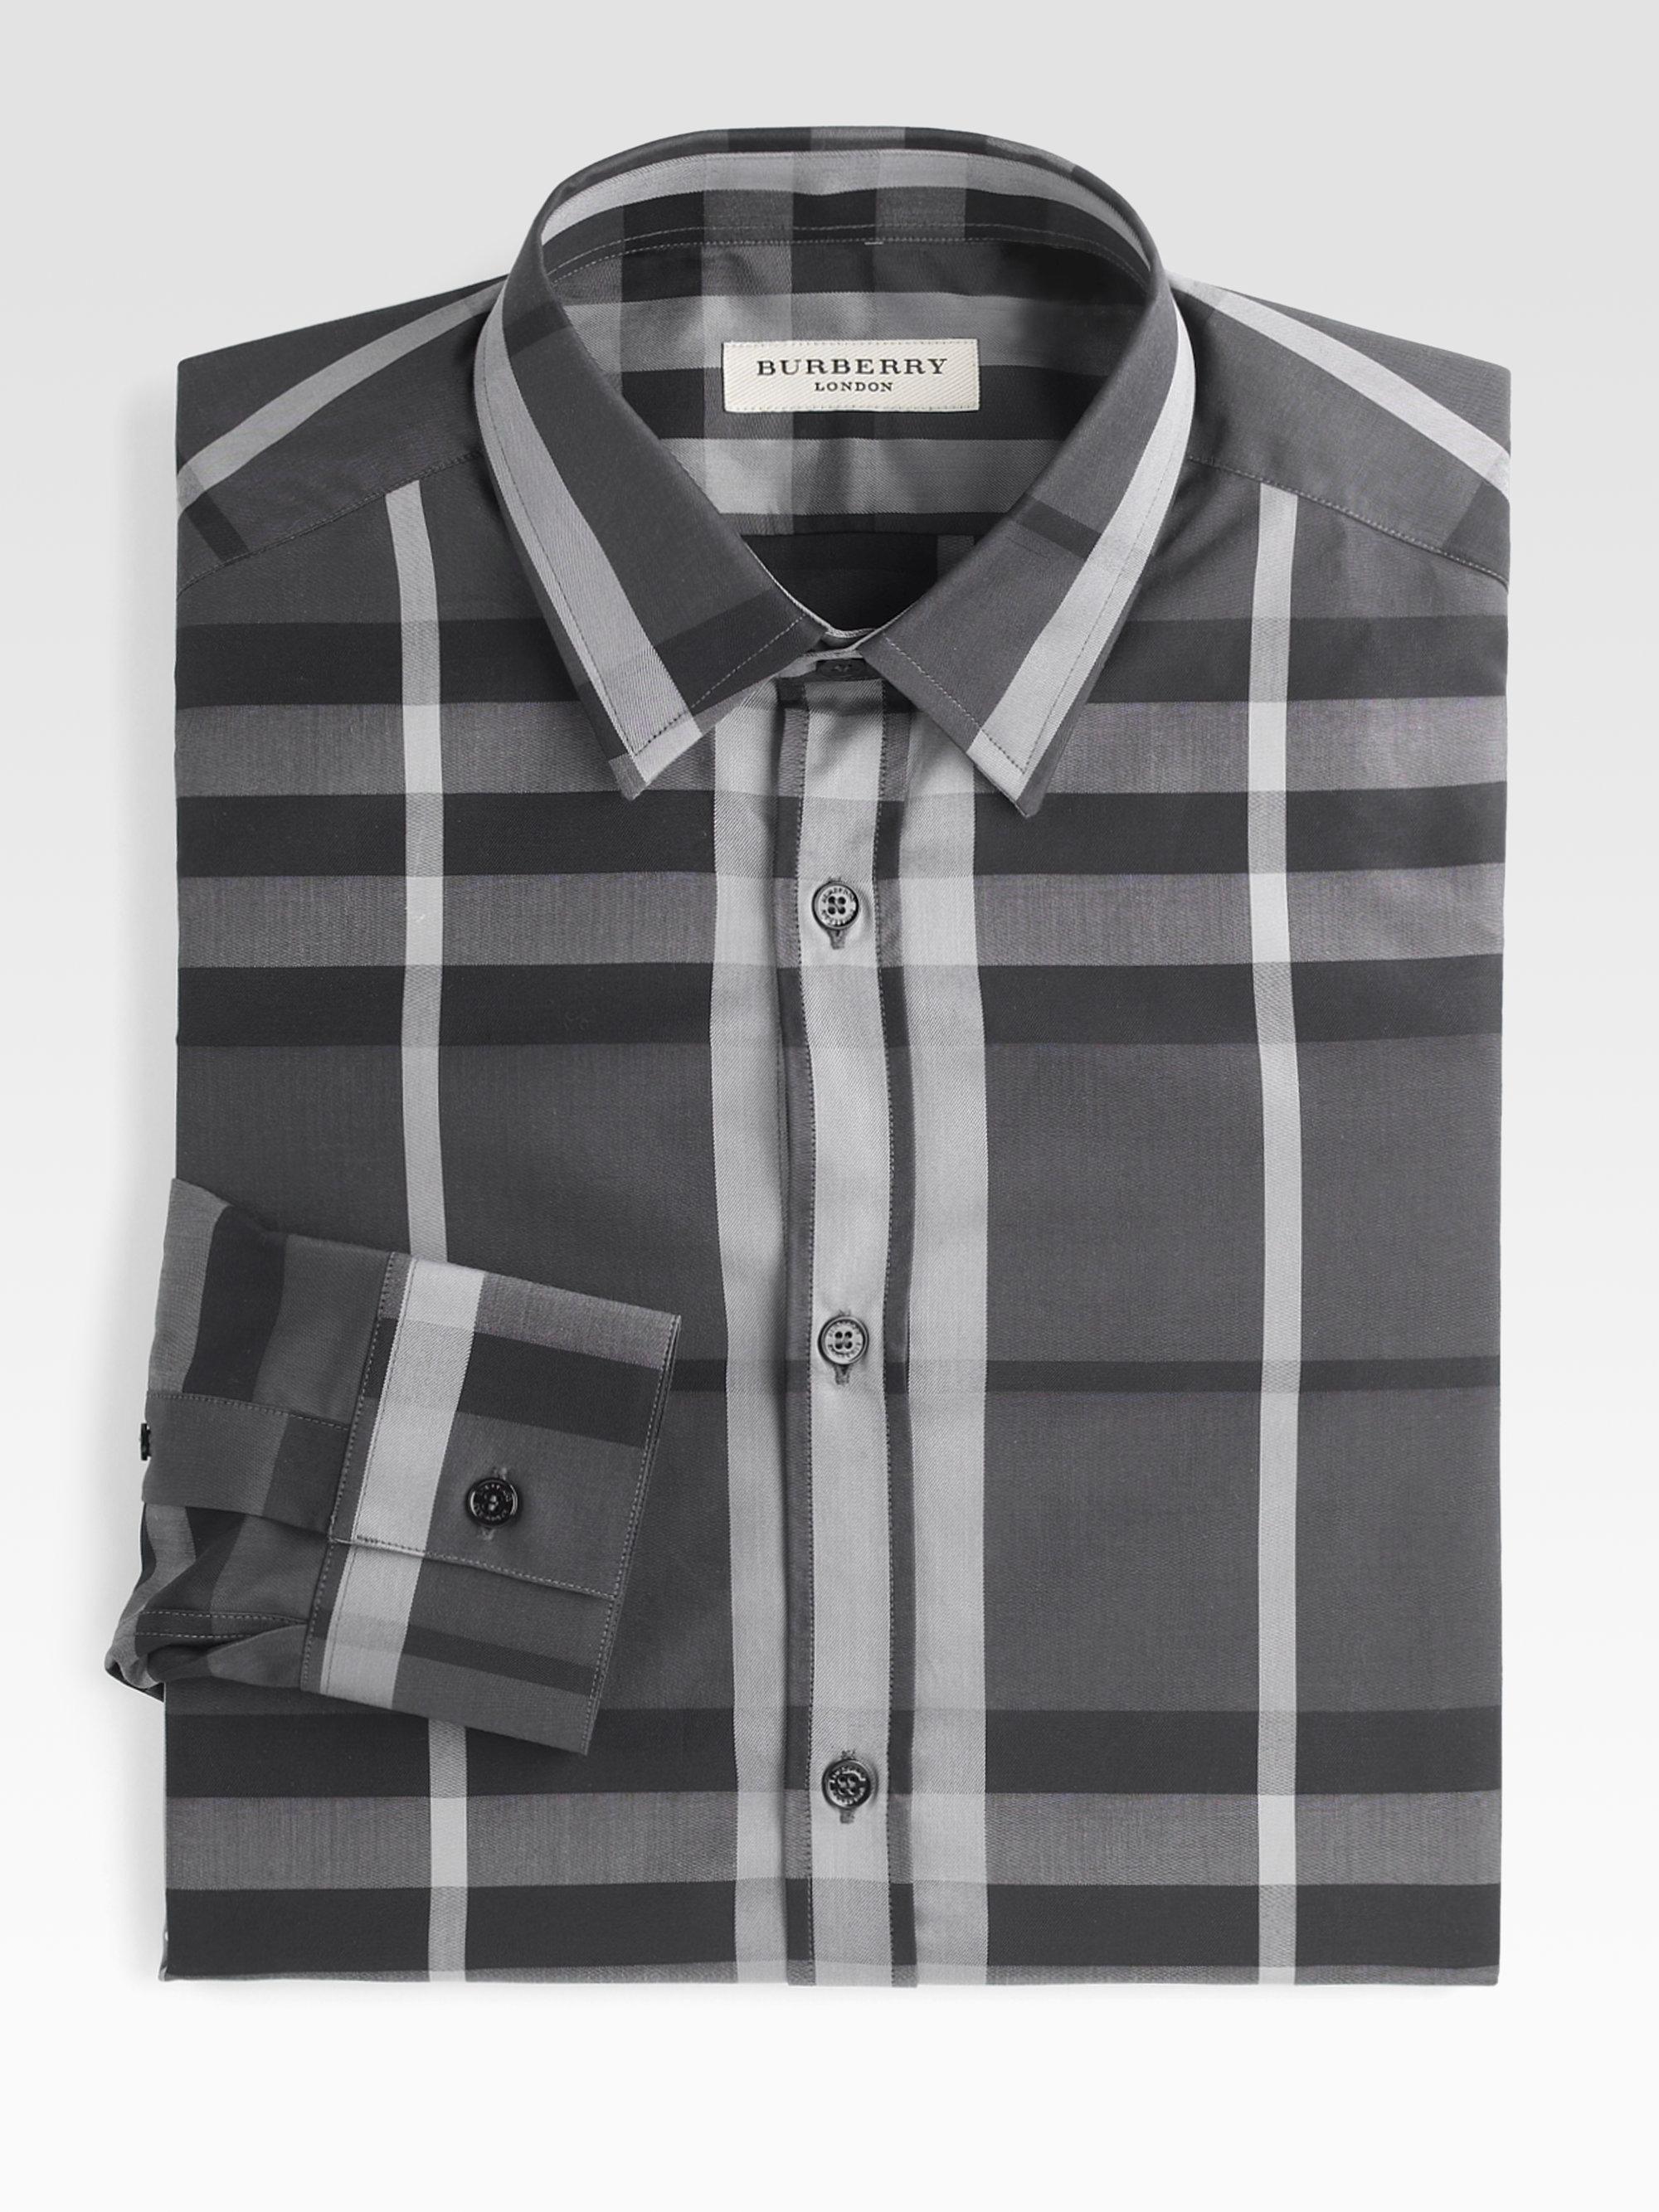 Burberry Treyforth Check Dress Shirt In Blue For Men Ink